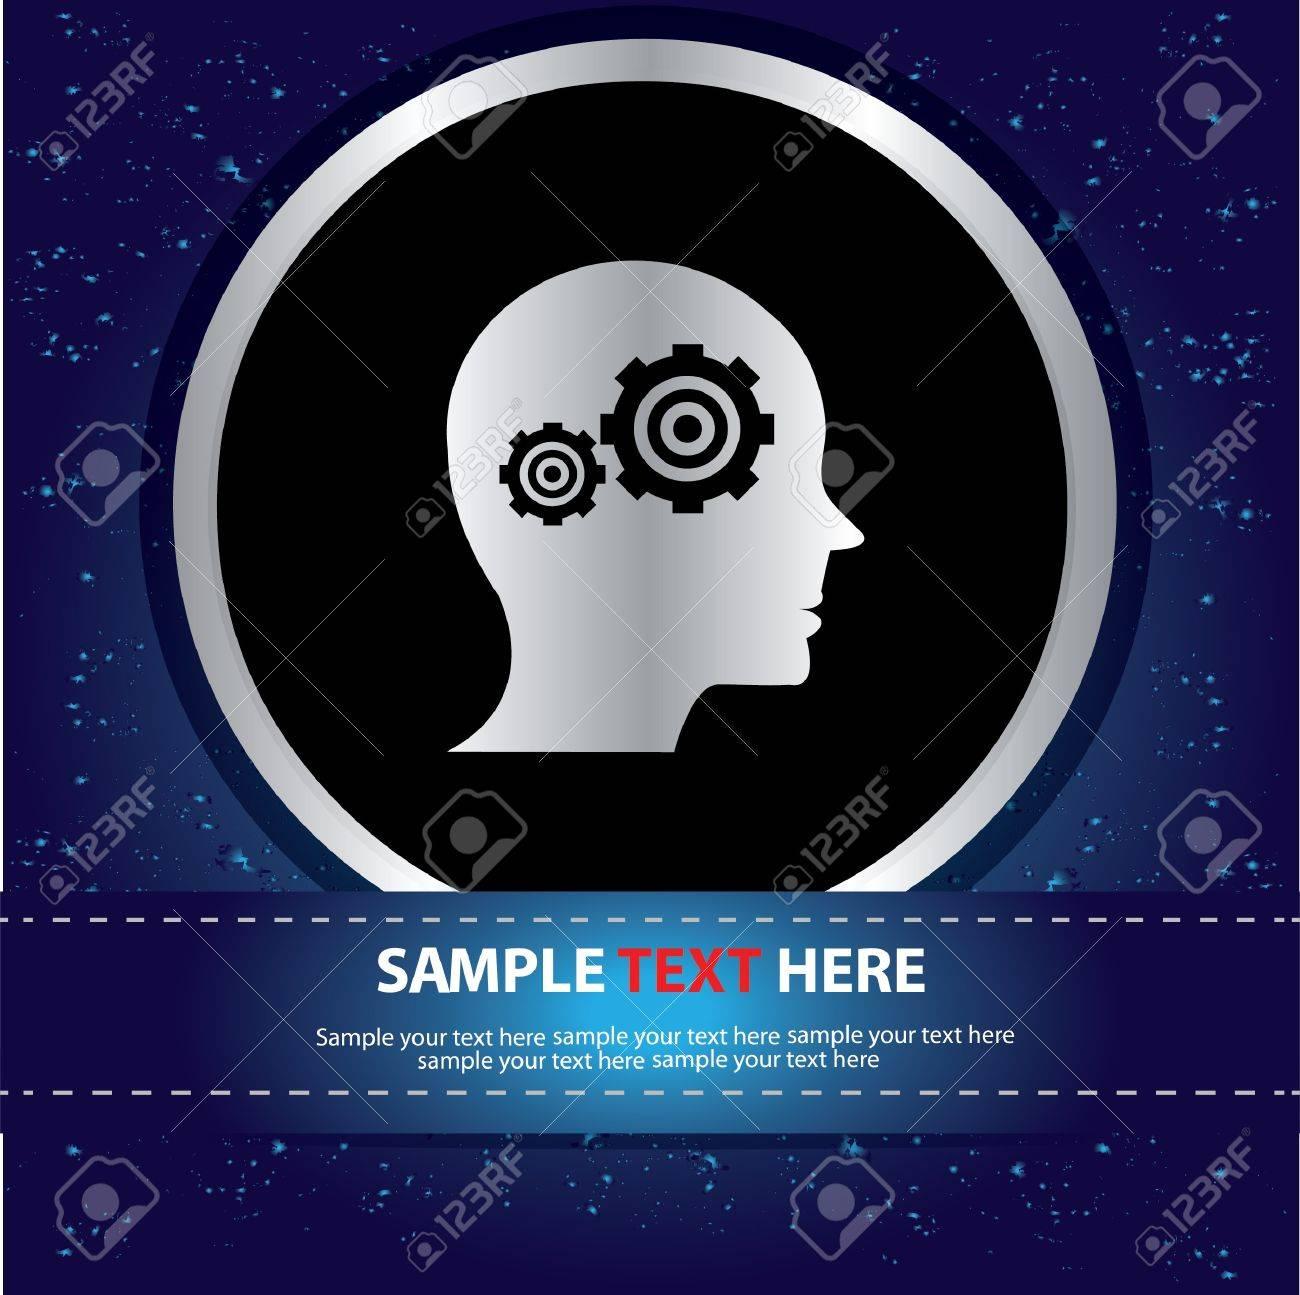 Engineersbrain symbolvector royalty free cliparts vectors and engineersbrain symbolvector stock vector 21569554 biocorpaavc Images